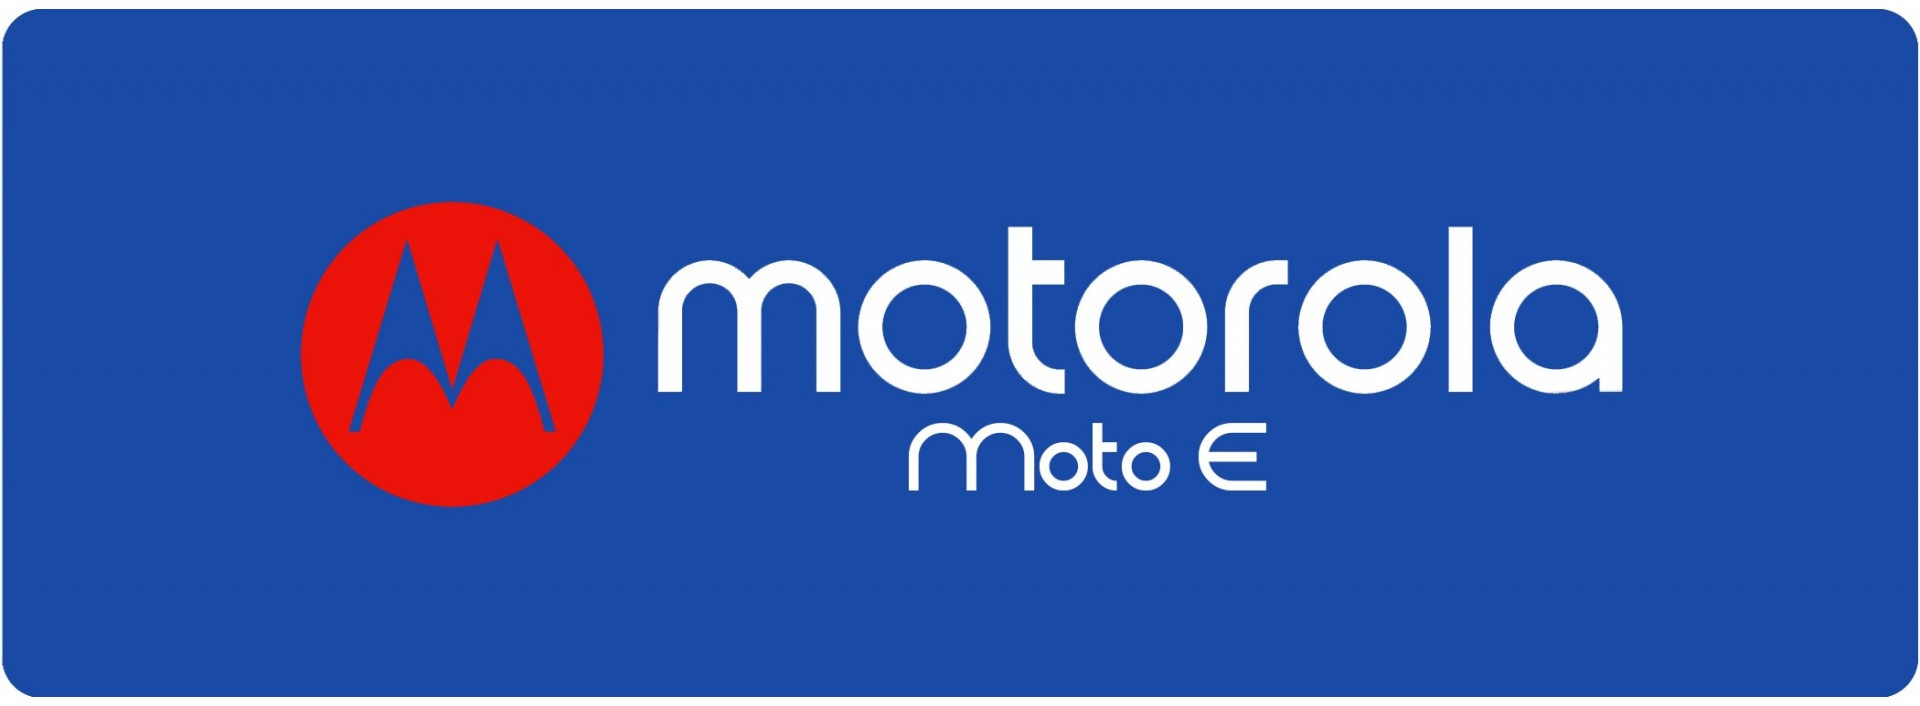 Fundas para Motorola Familia Moto E